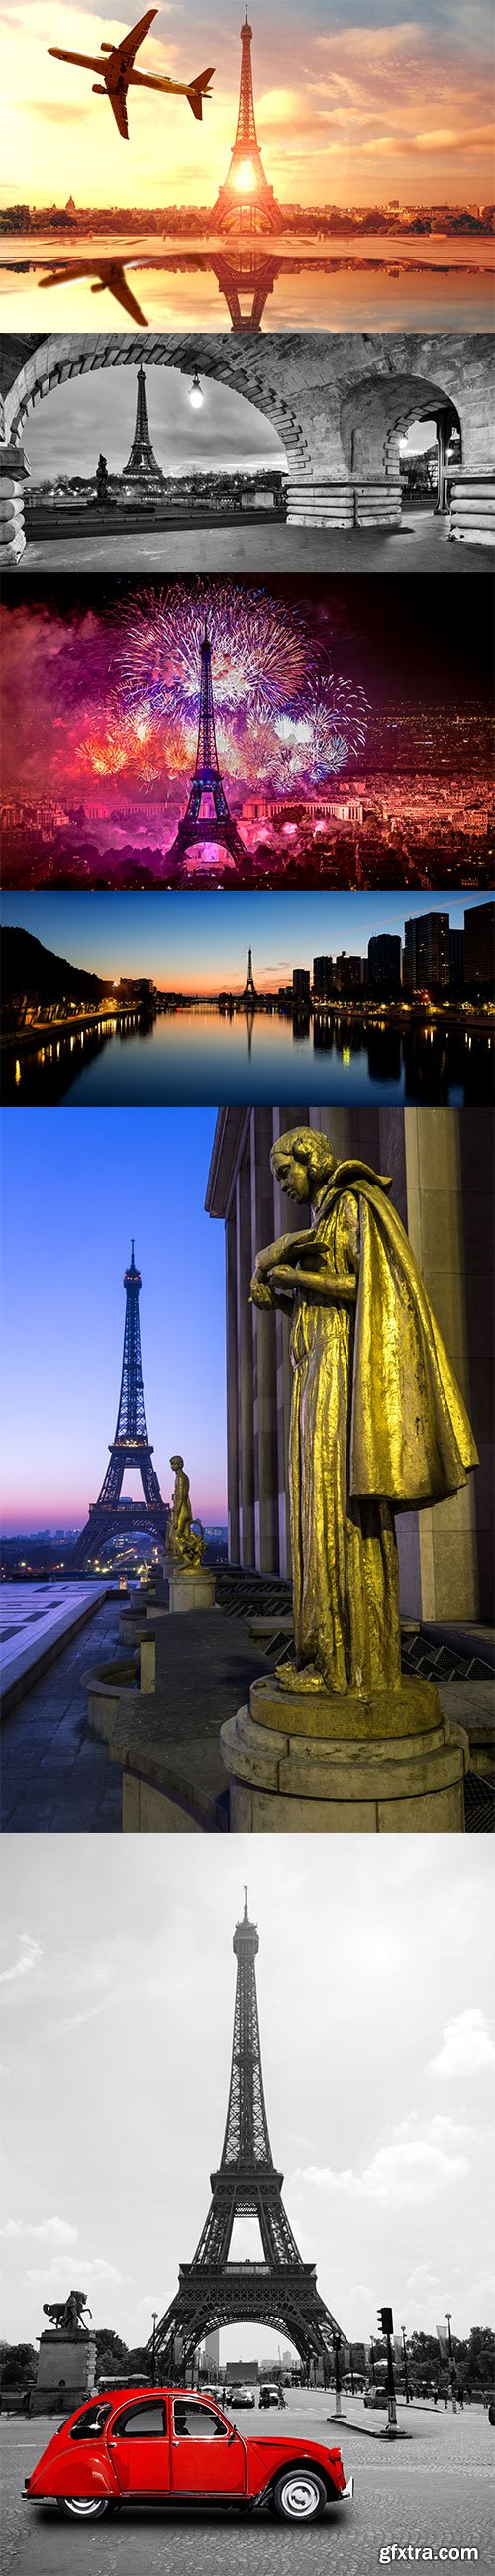 Photo - Eiffel Tower - 11xJPGs